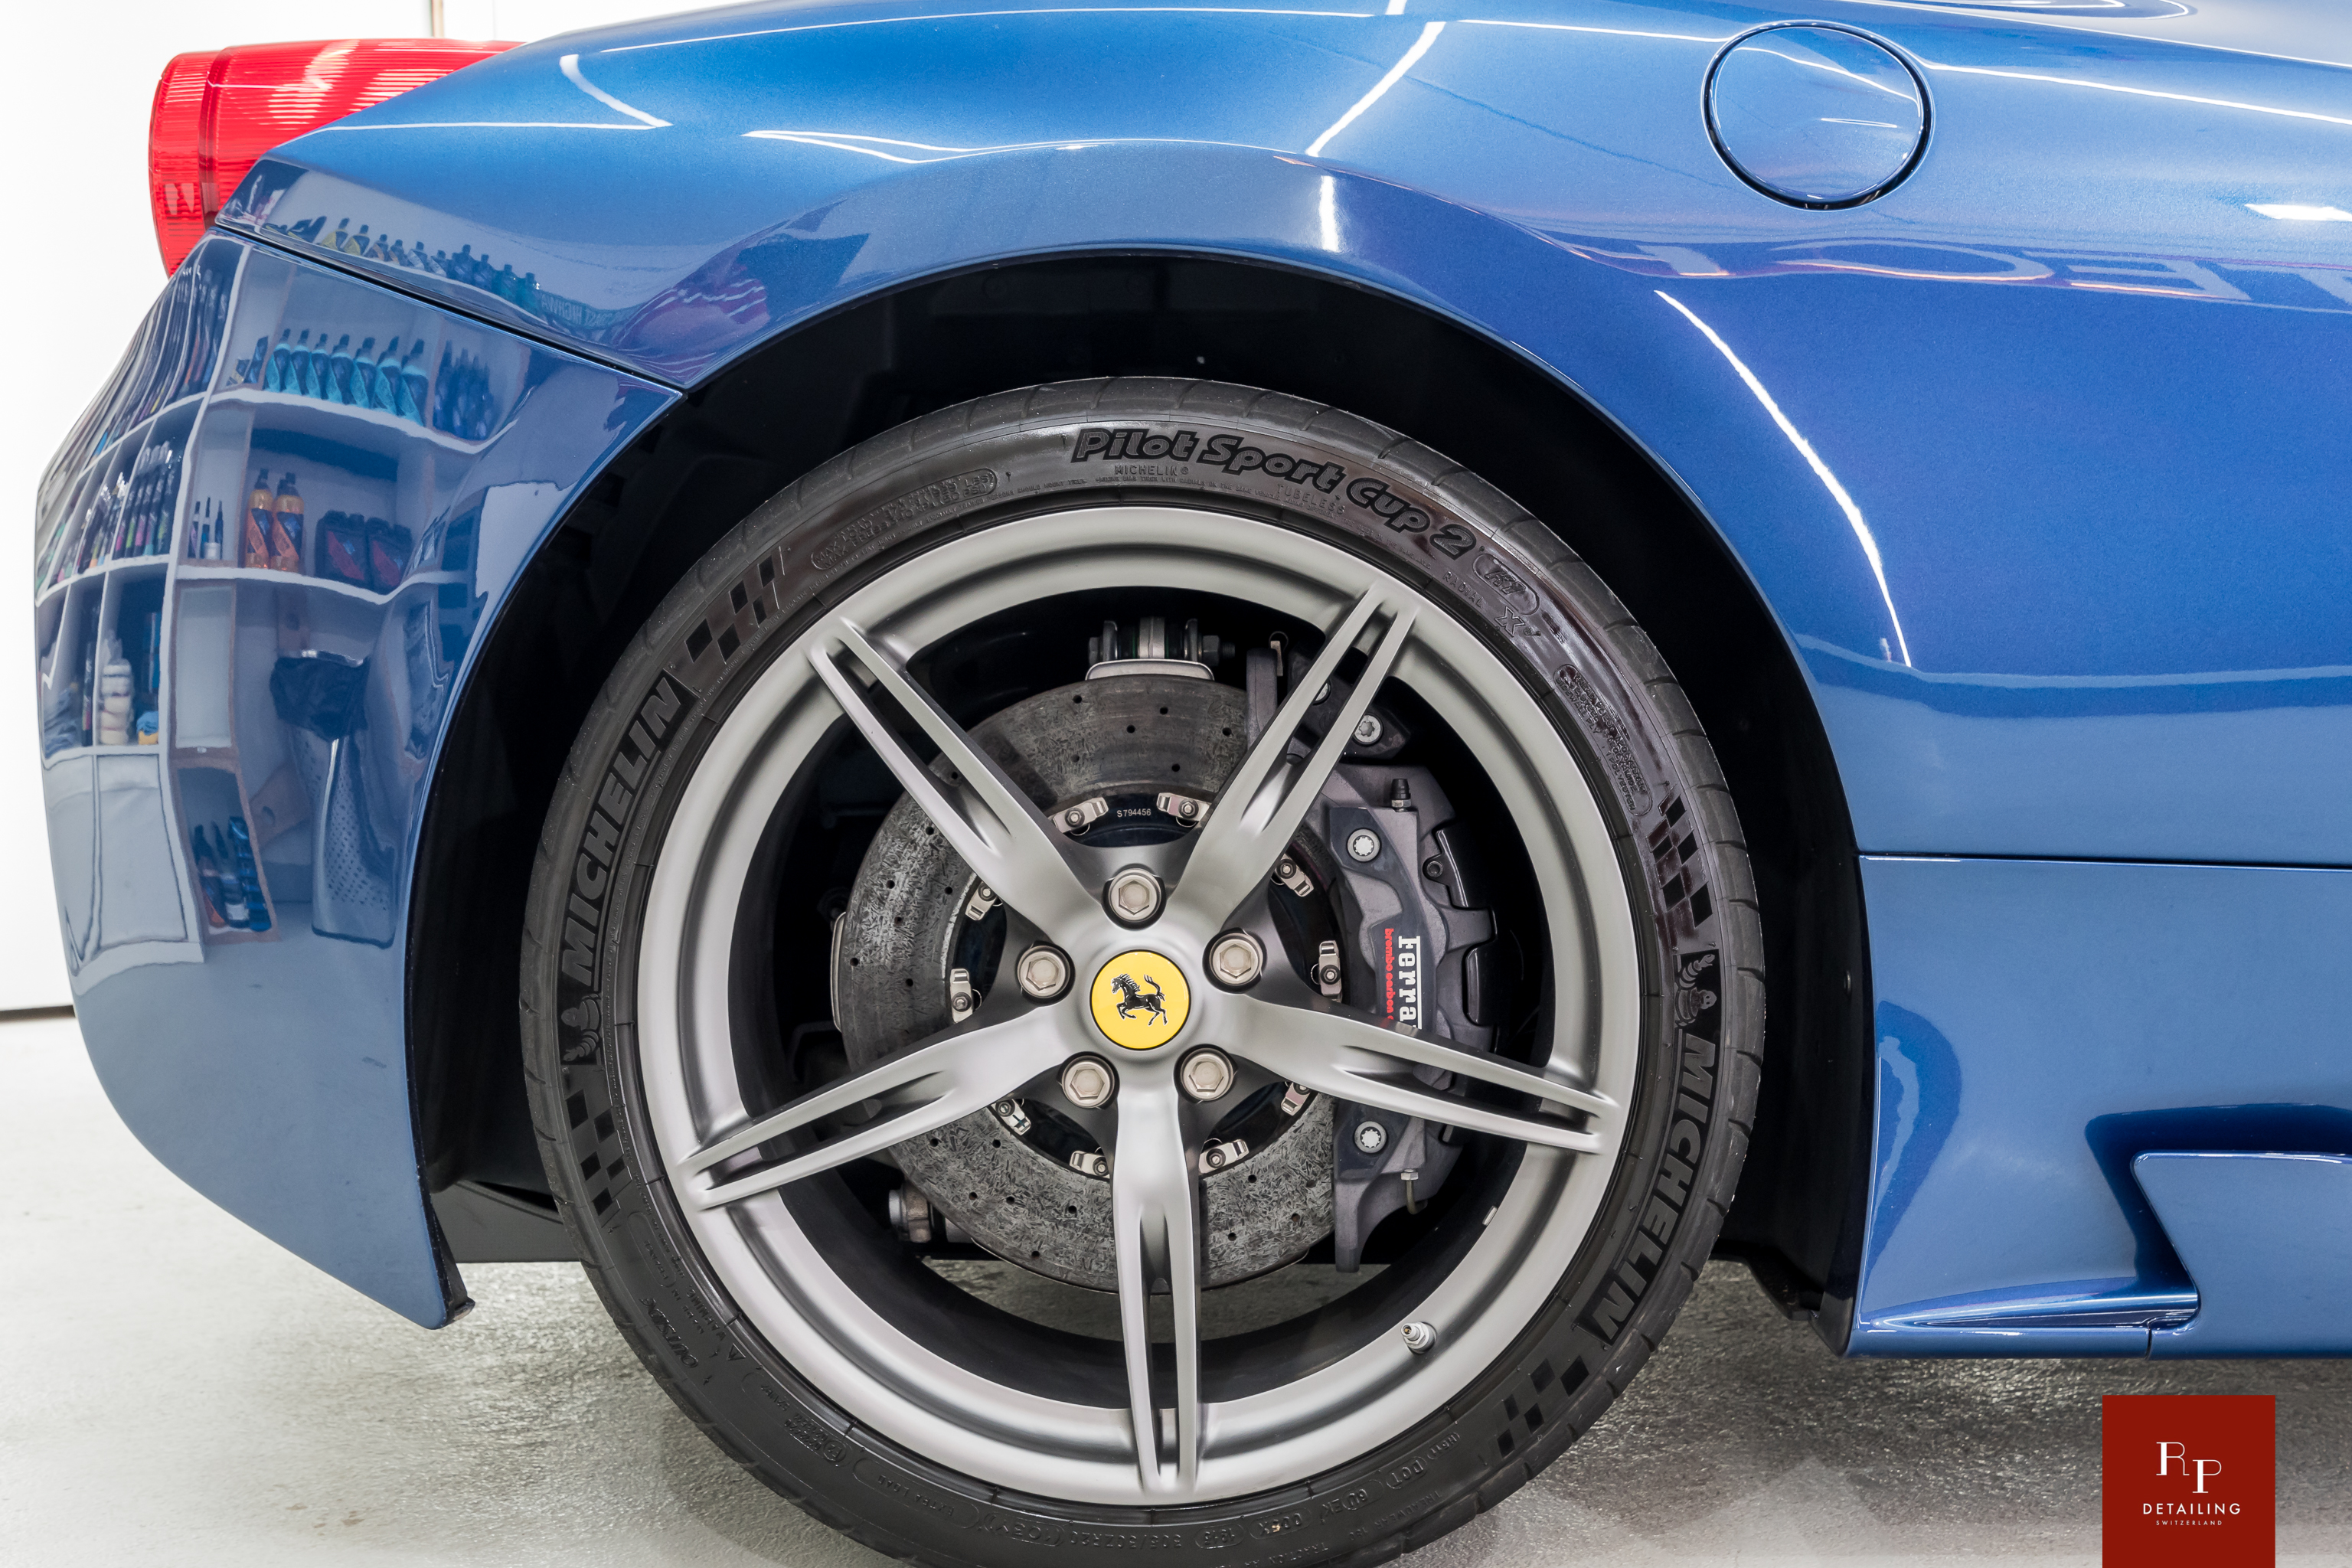 Ferrari%20Speciale%20RP%2013.jpg